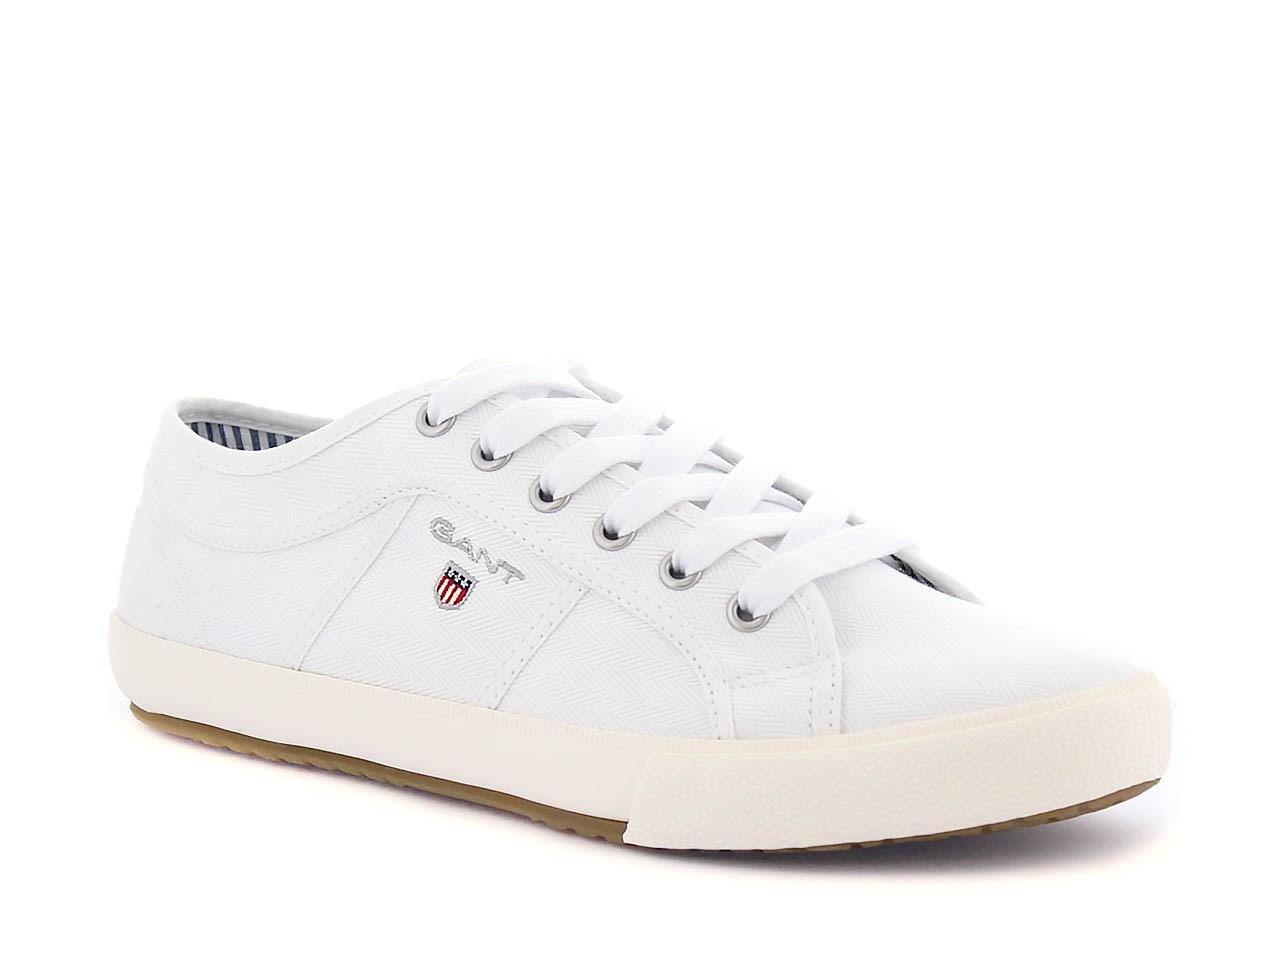 Skor Herr | Sneakers Herr GANT